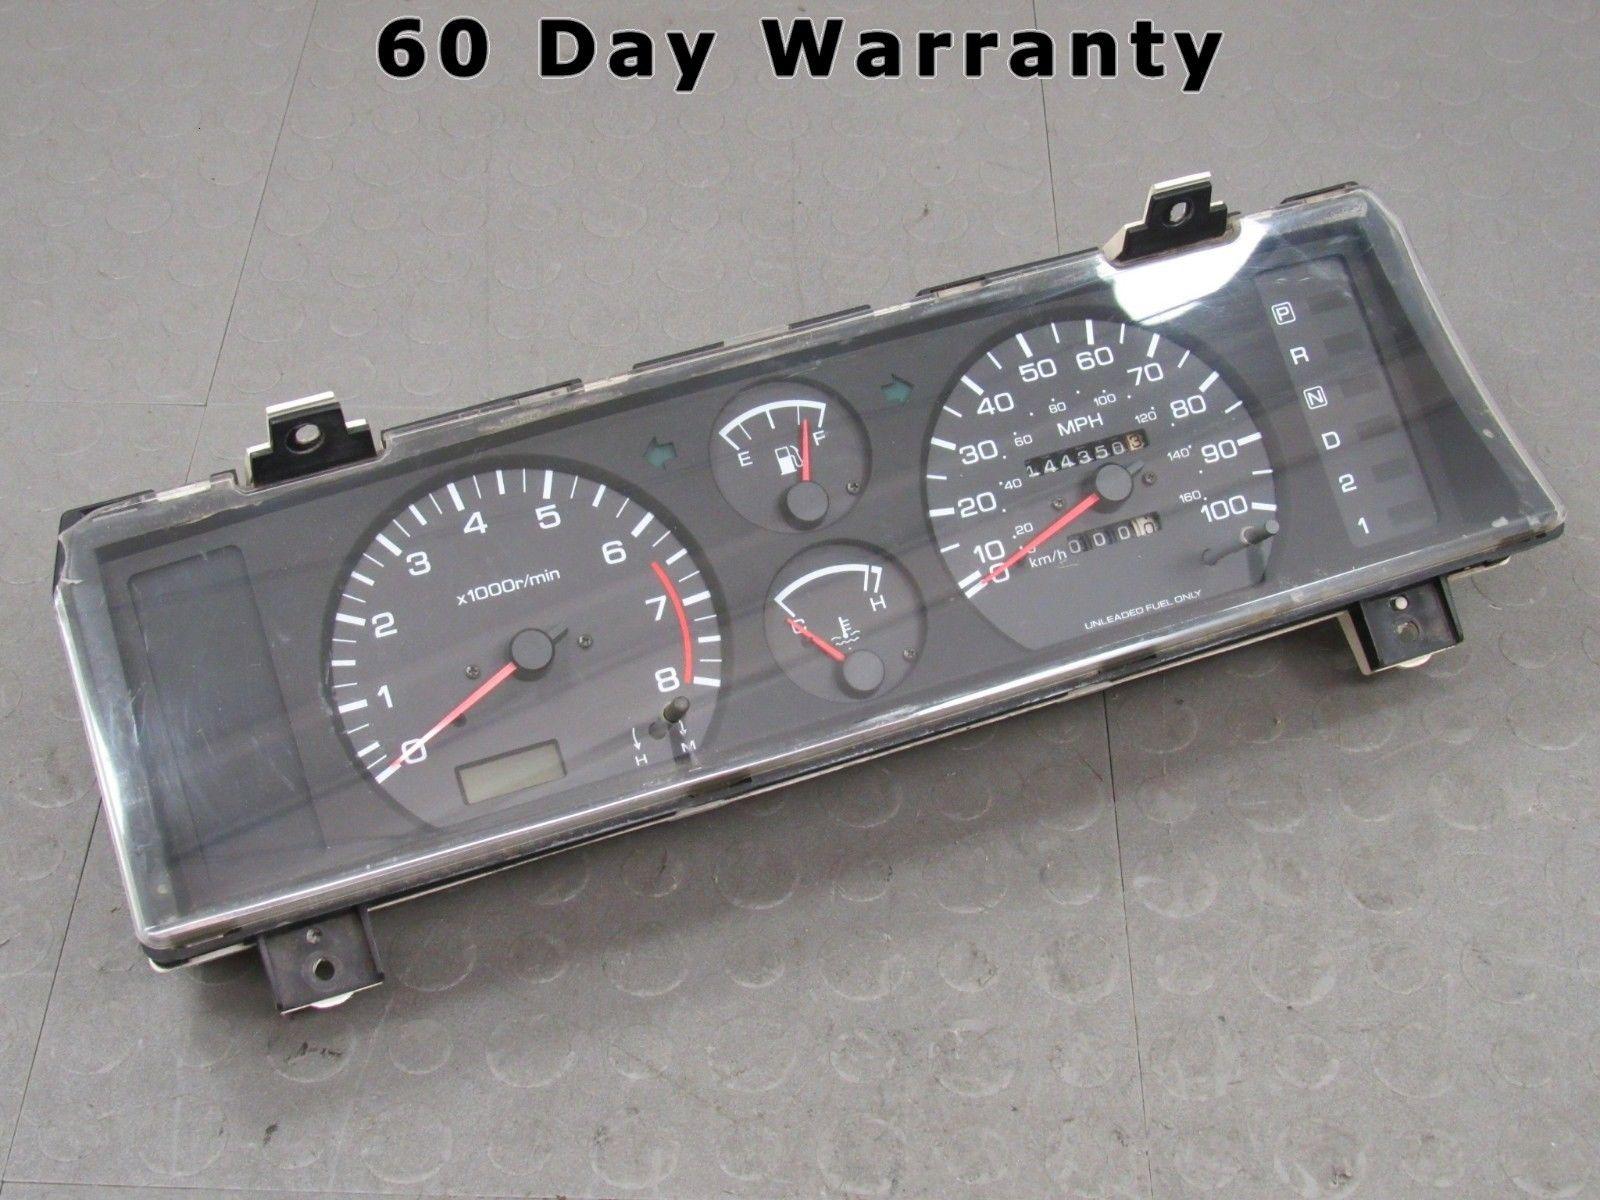 93 Nissan Pickup Hard Body D21 2 4L A/T Instrument Gauge Cluster Tach  144,350